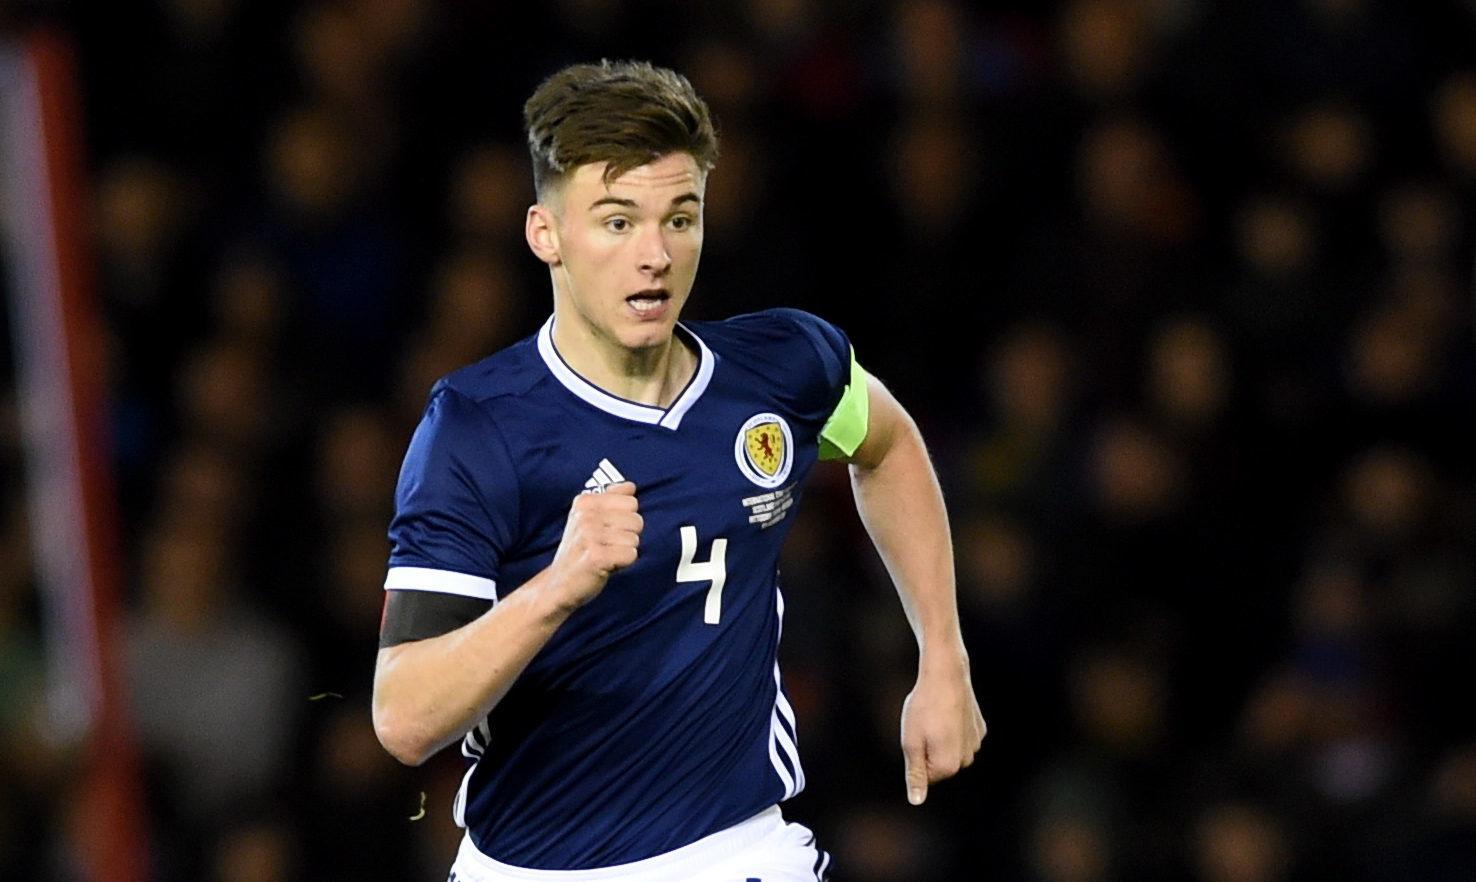 Kieran Tierney captaining Scotland against the Netherlands (Darrell Benns / DC Thomson)